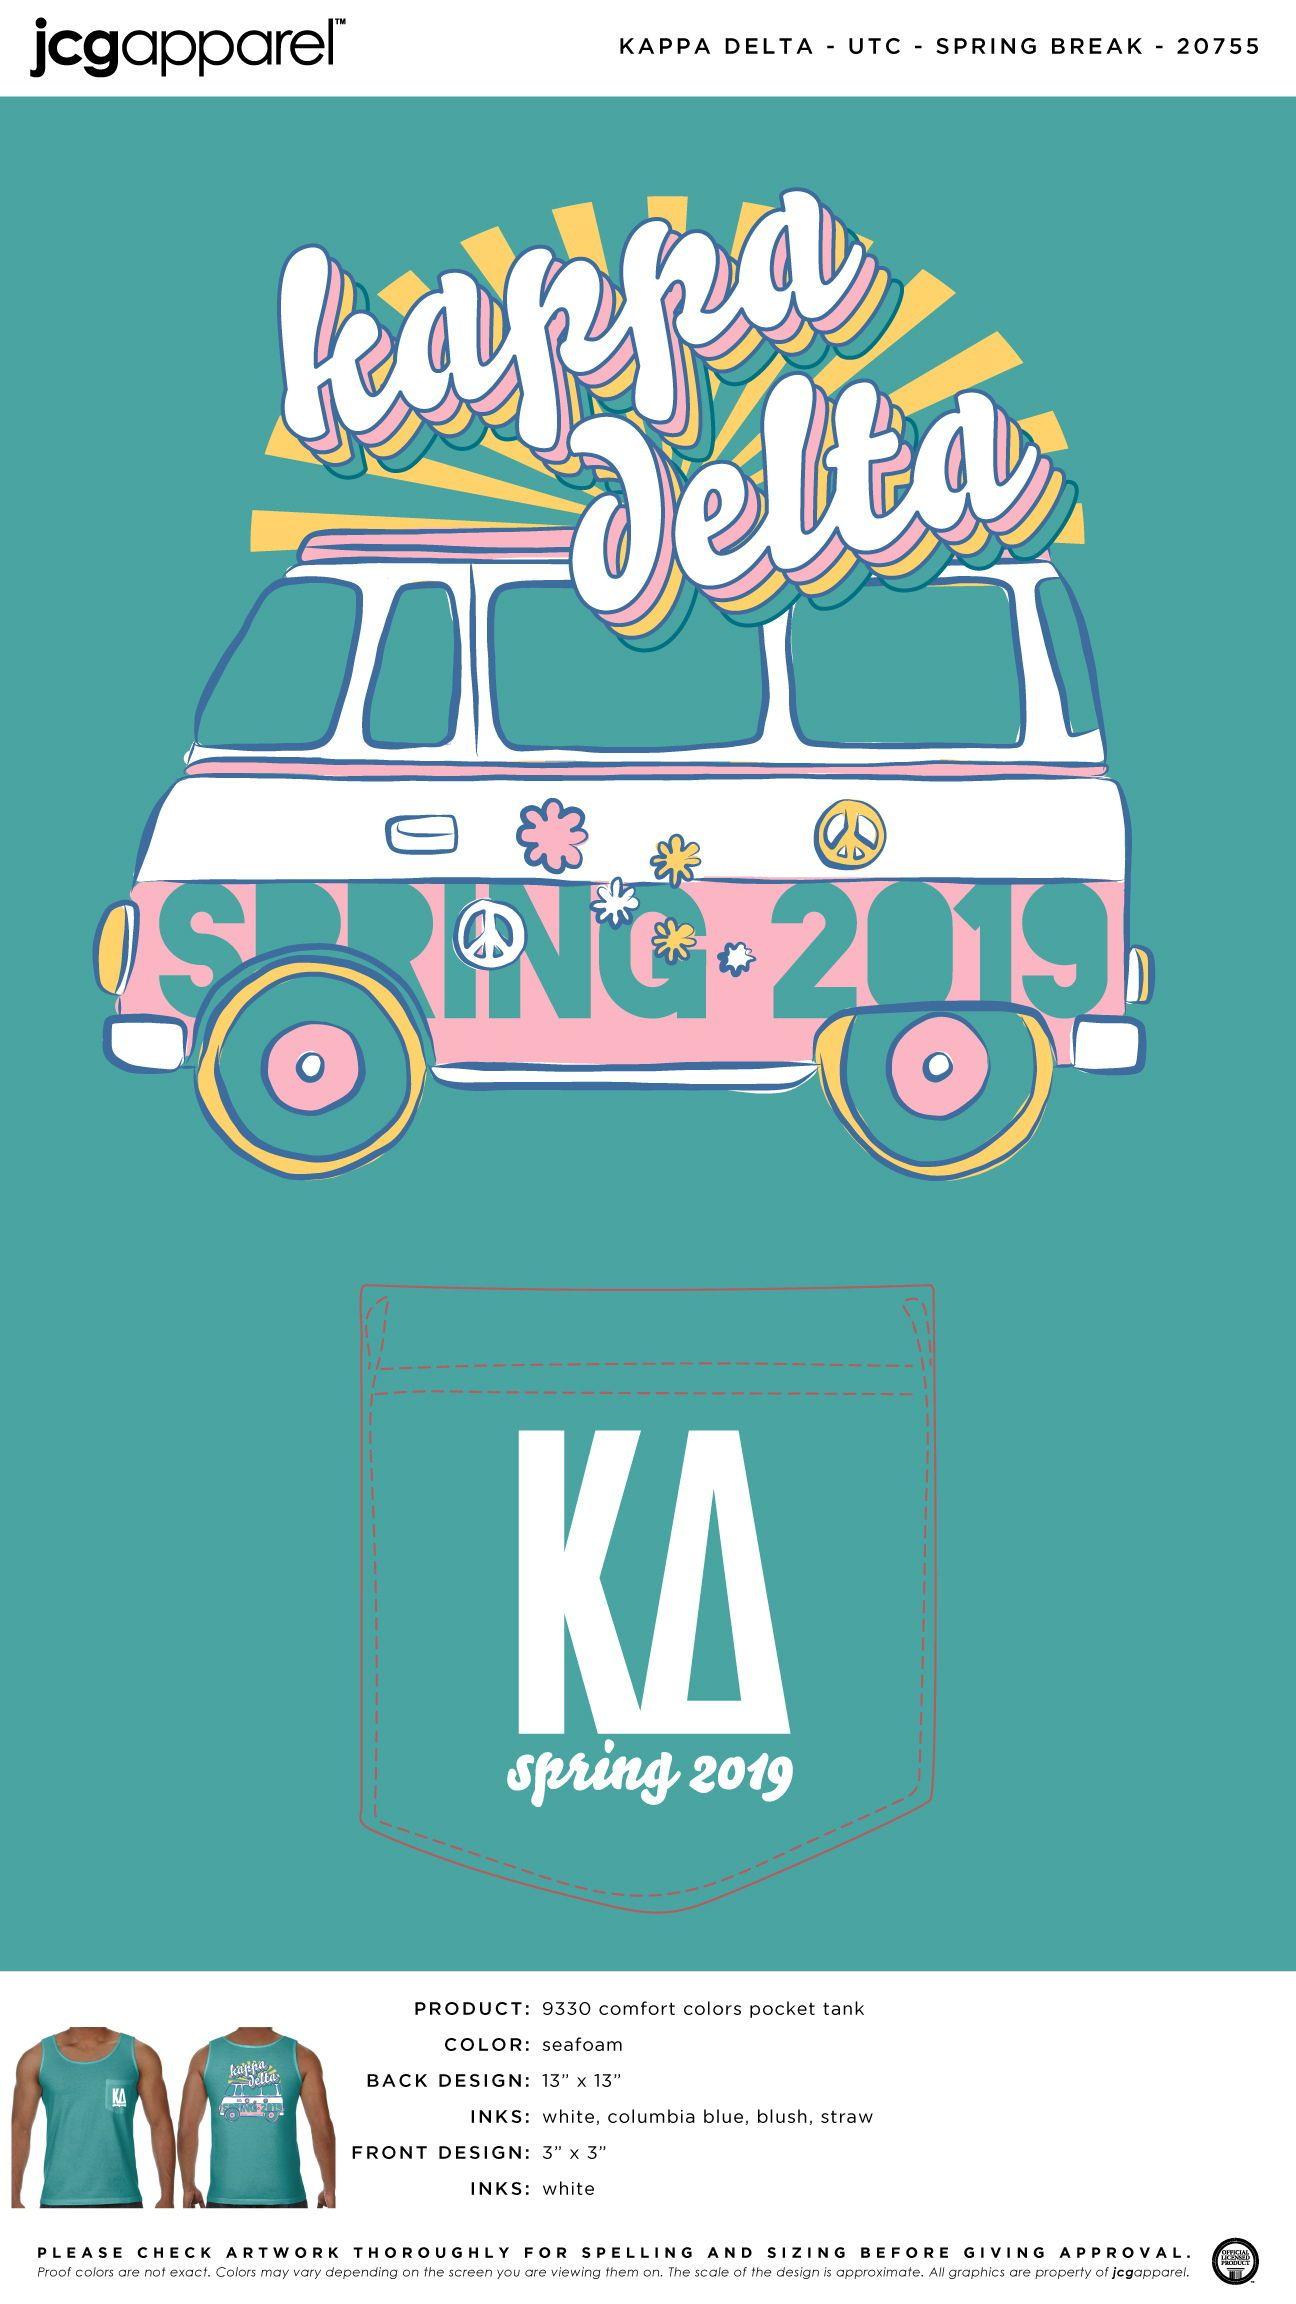 a3ffacfd8 Kappa Delta Spring Break Shirt | Sorority Spring Break | Greek Spring Break  #kappadelta #kaydee #kd #spring #break #retro #design #colorful #sunshine